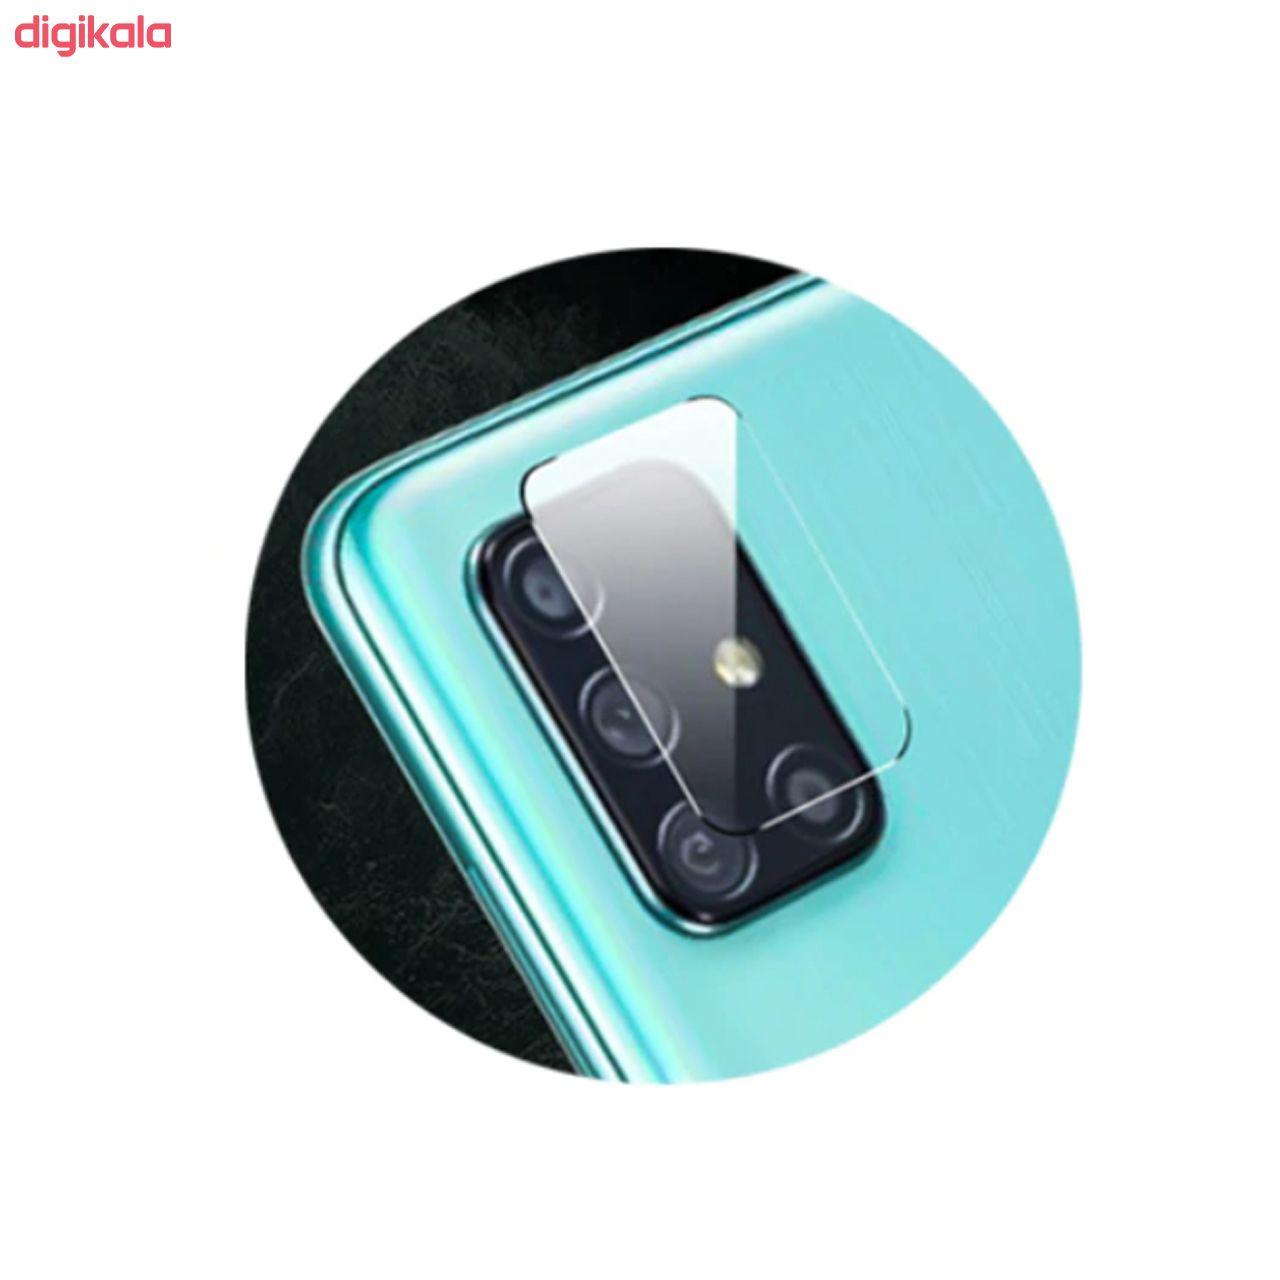 محافظ لنز دوربین سیحان مدل GLP مناسب برای گوشی موبایل سامسونگ Galaxy A51 main 1 2